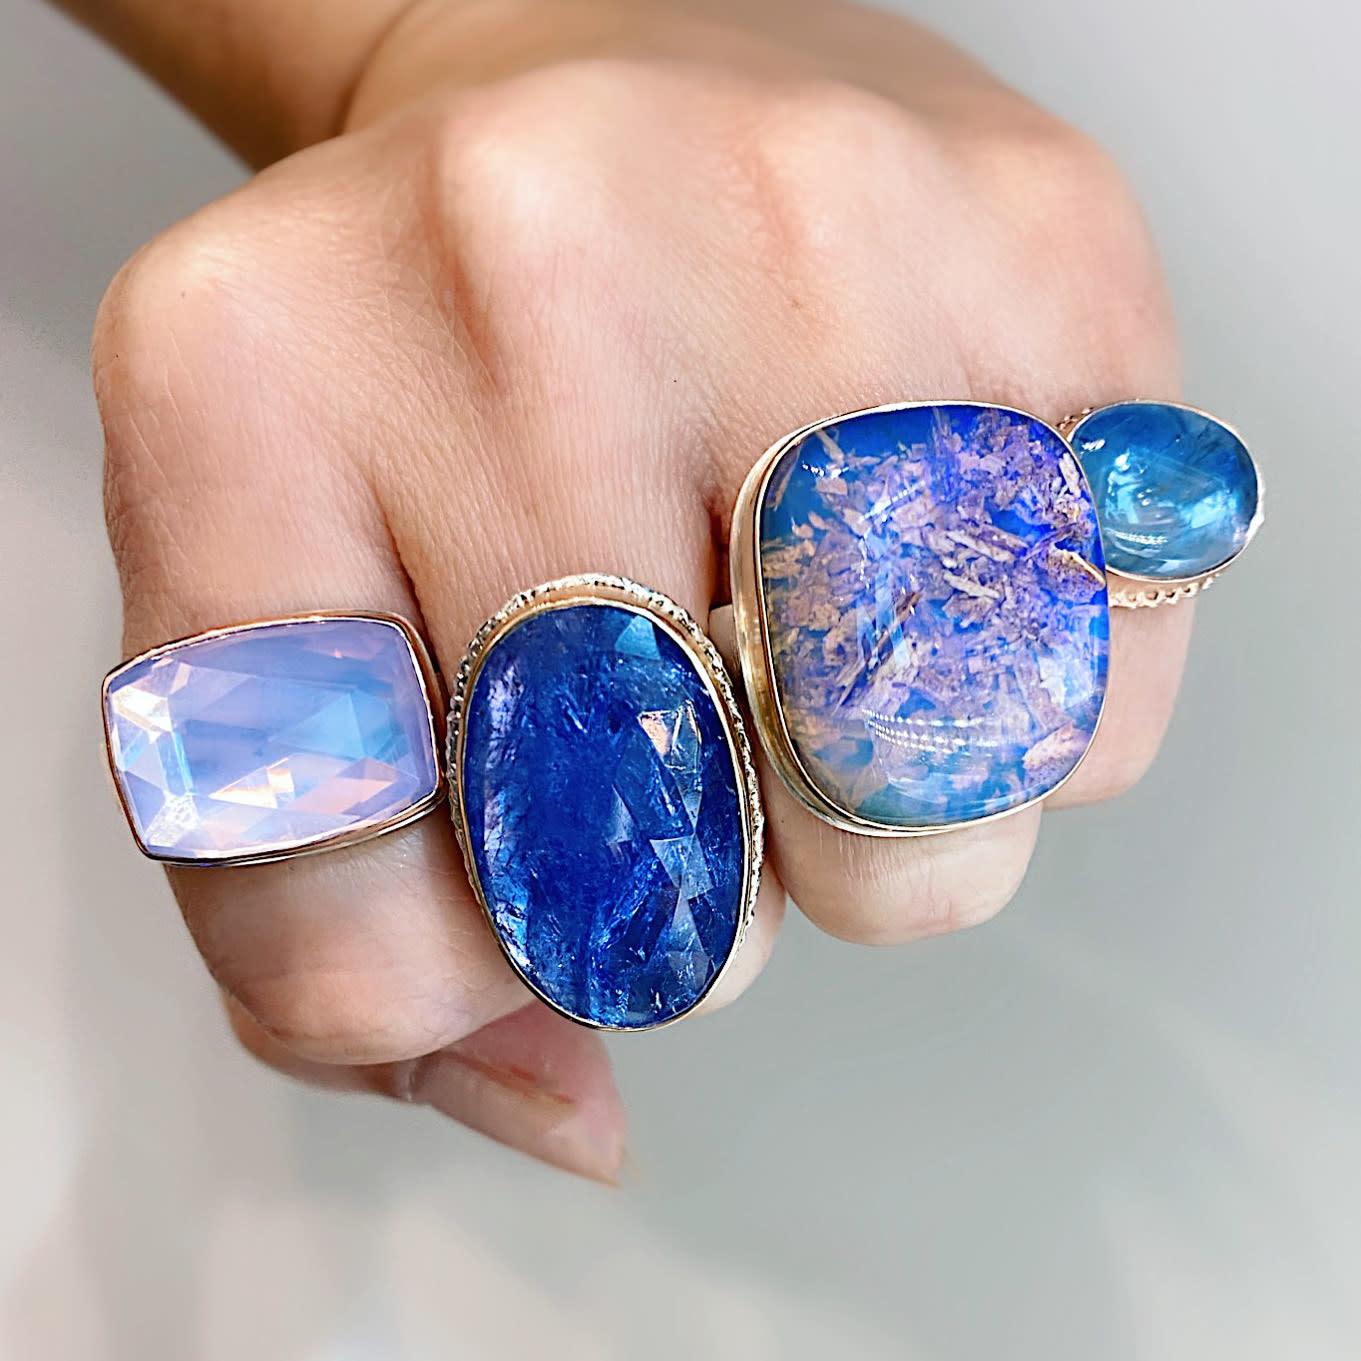 Jamie Joseph Jewelry Designs Smooth Blue Sapphire Bezel Ring